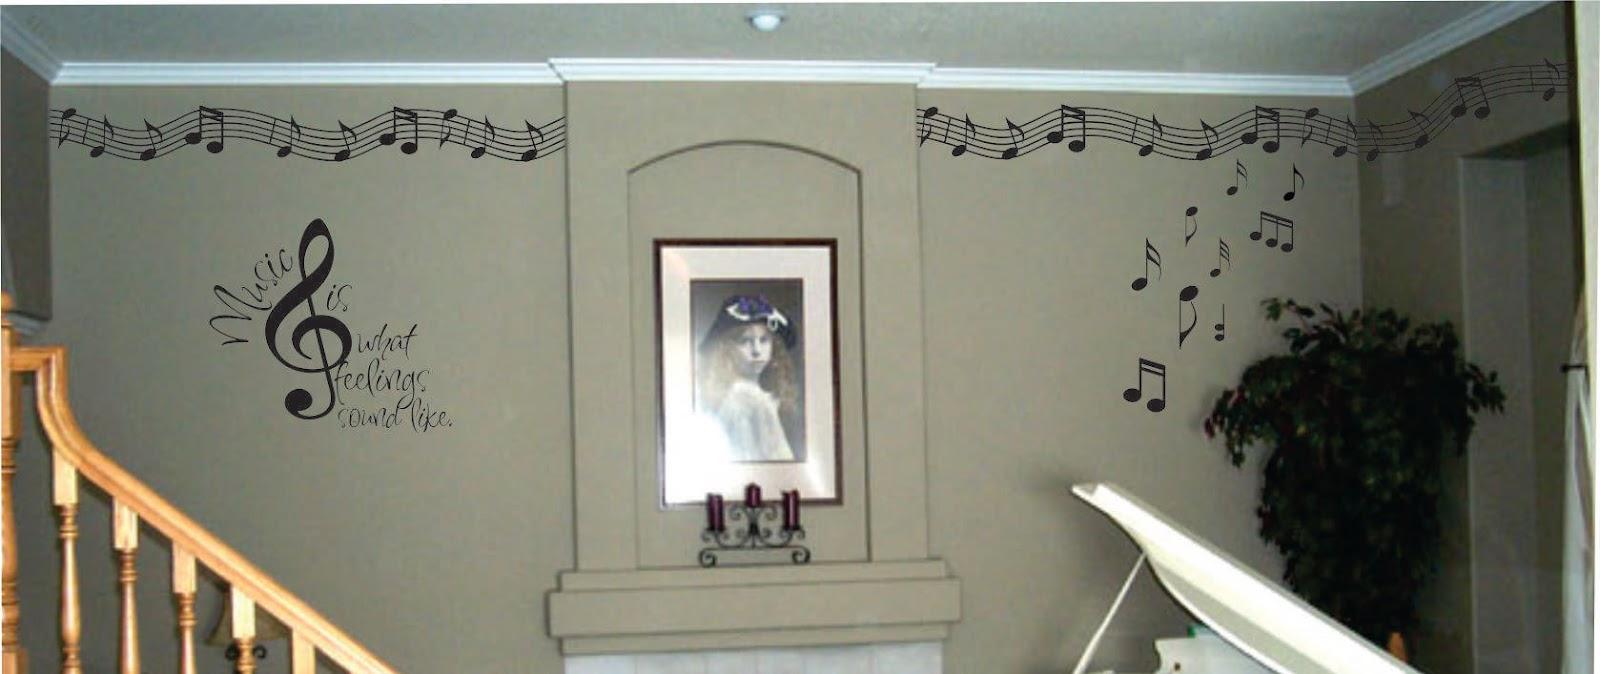 Walls that talk music room decorating ideas for Music room decor diy